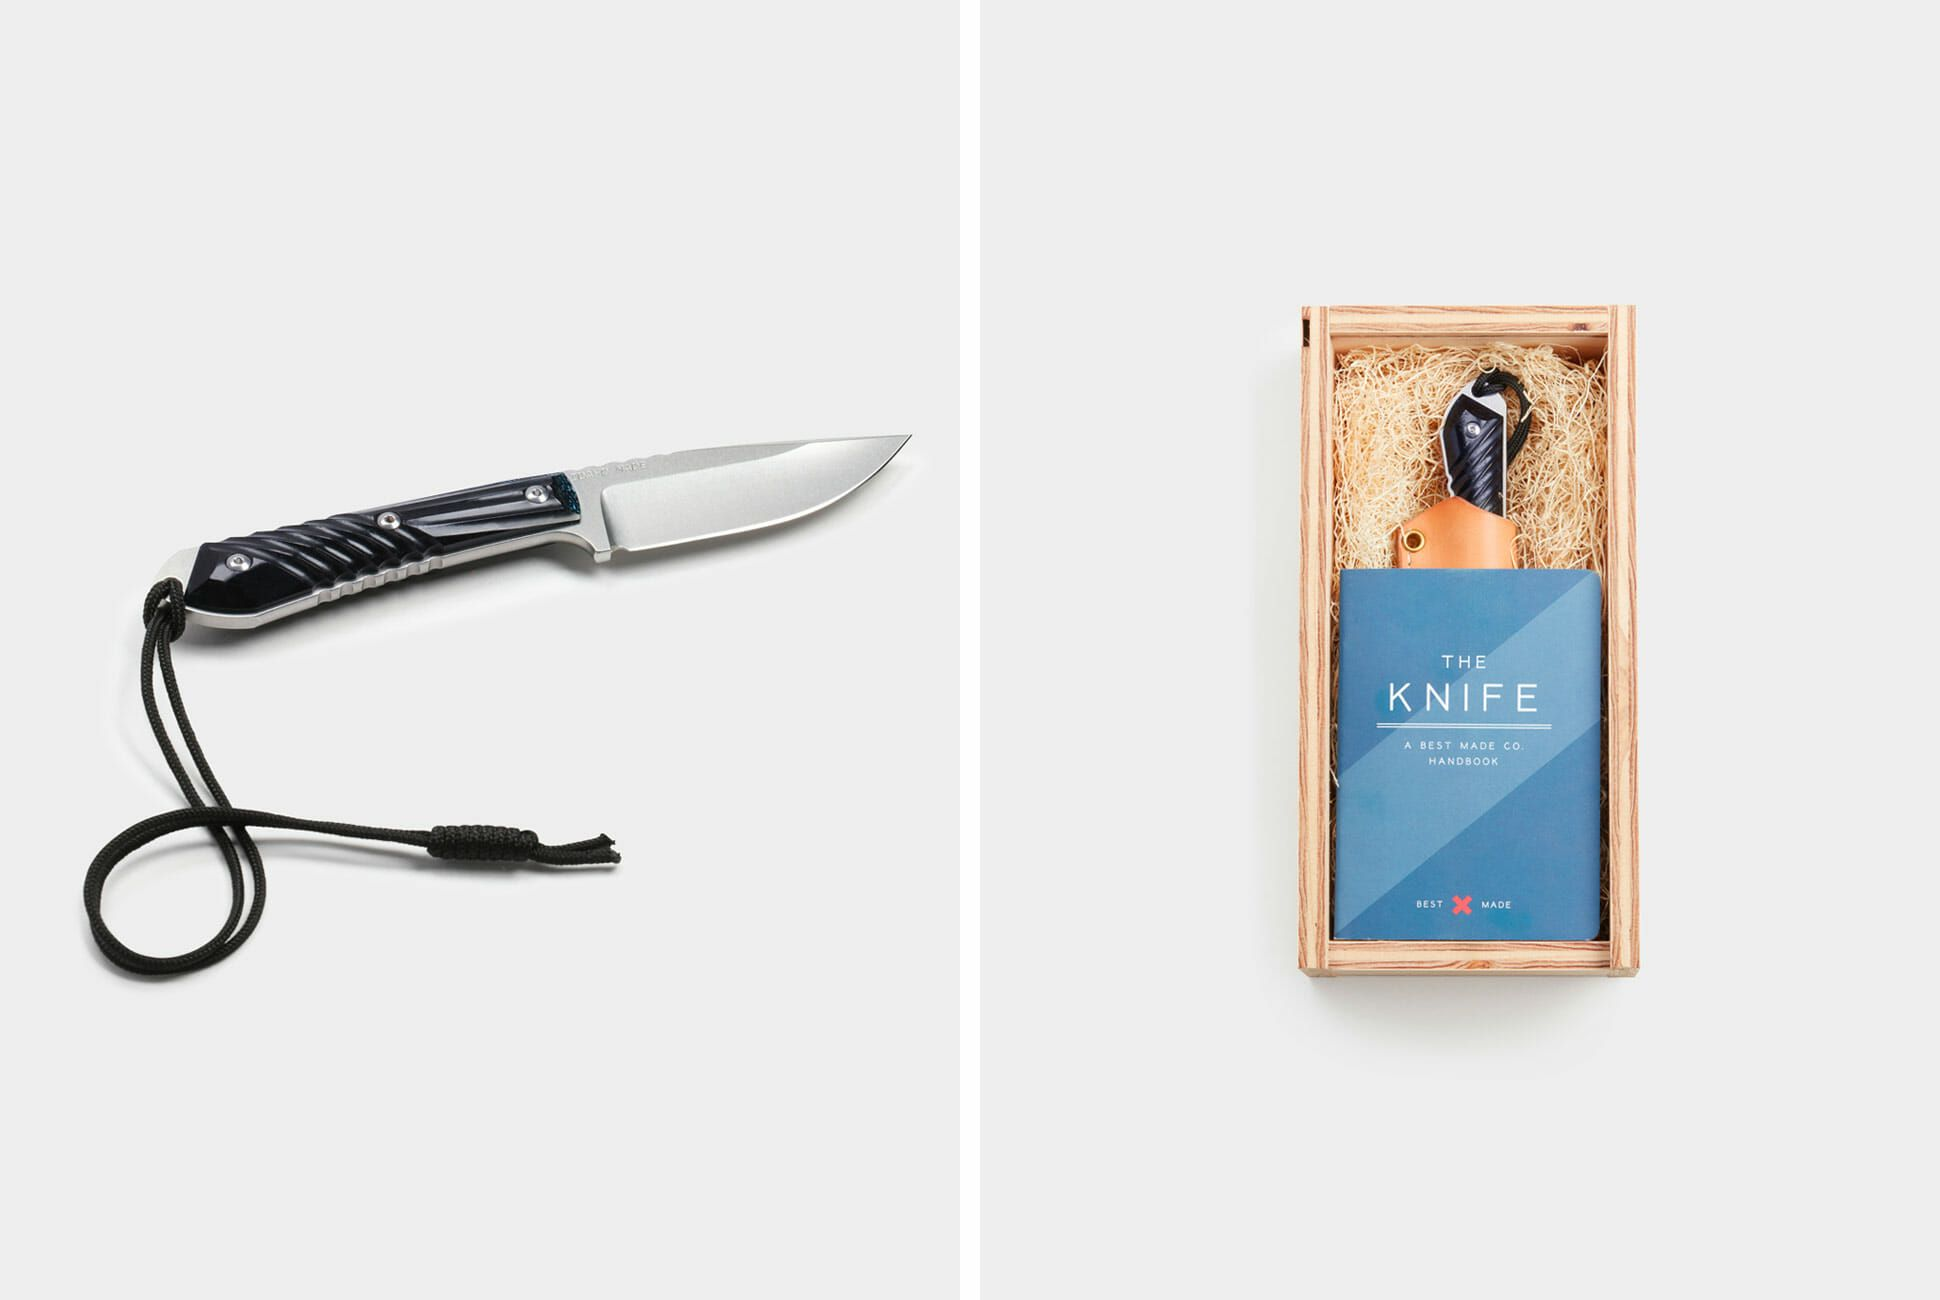 Best-Made-Nyala-Knife-gear-patrol-full-lead